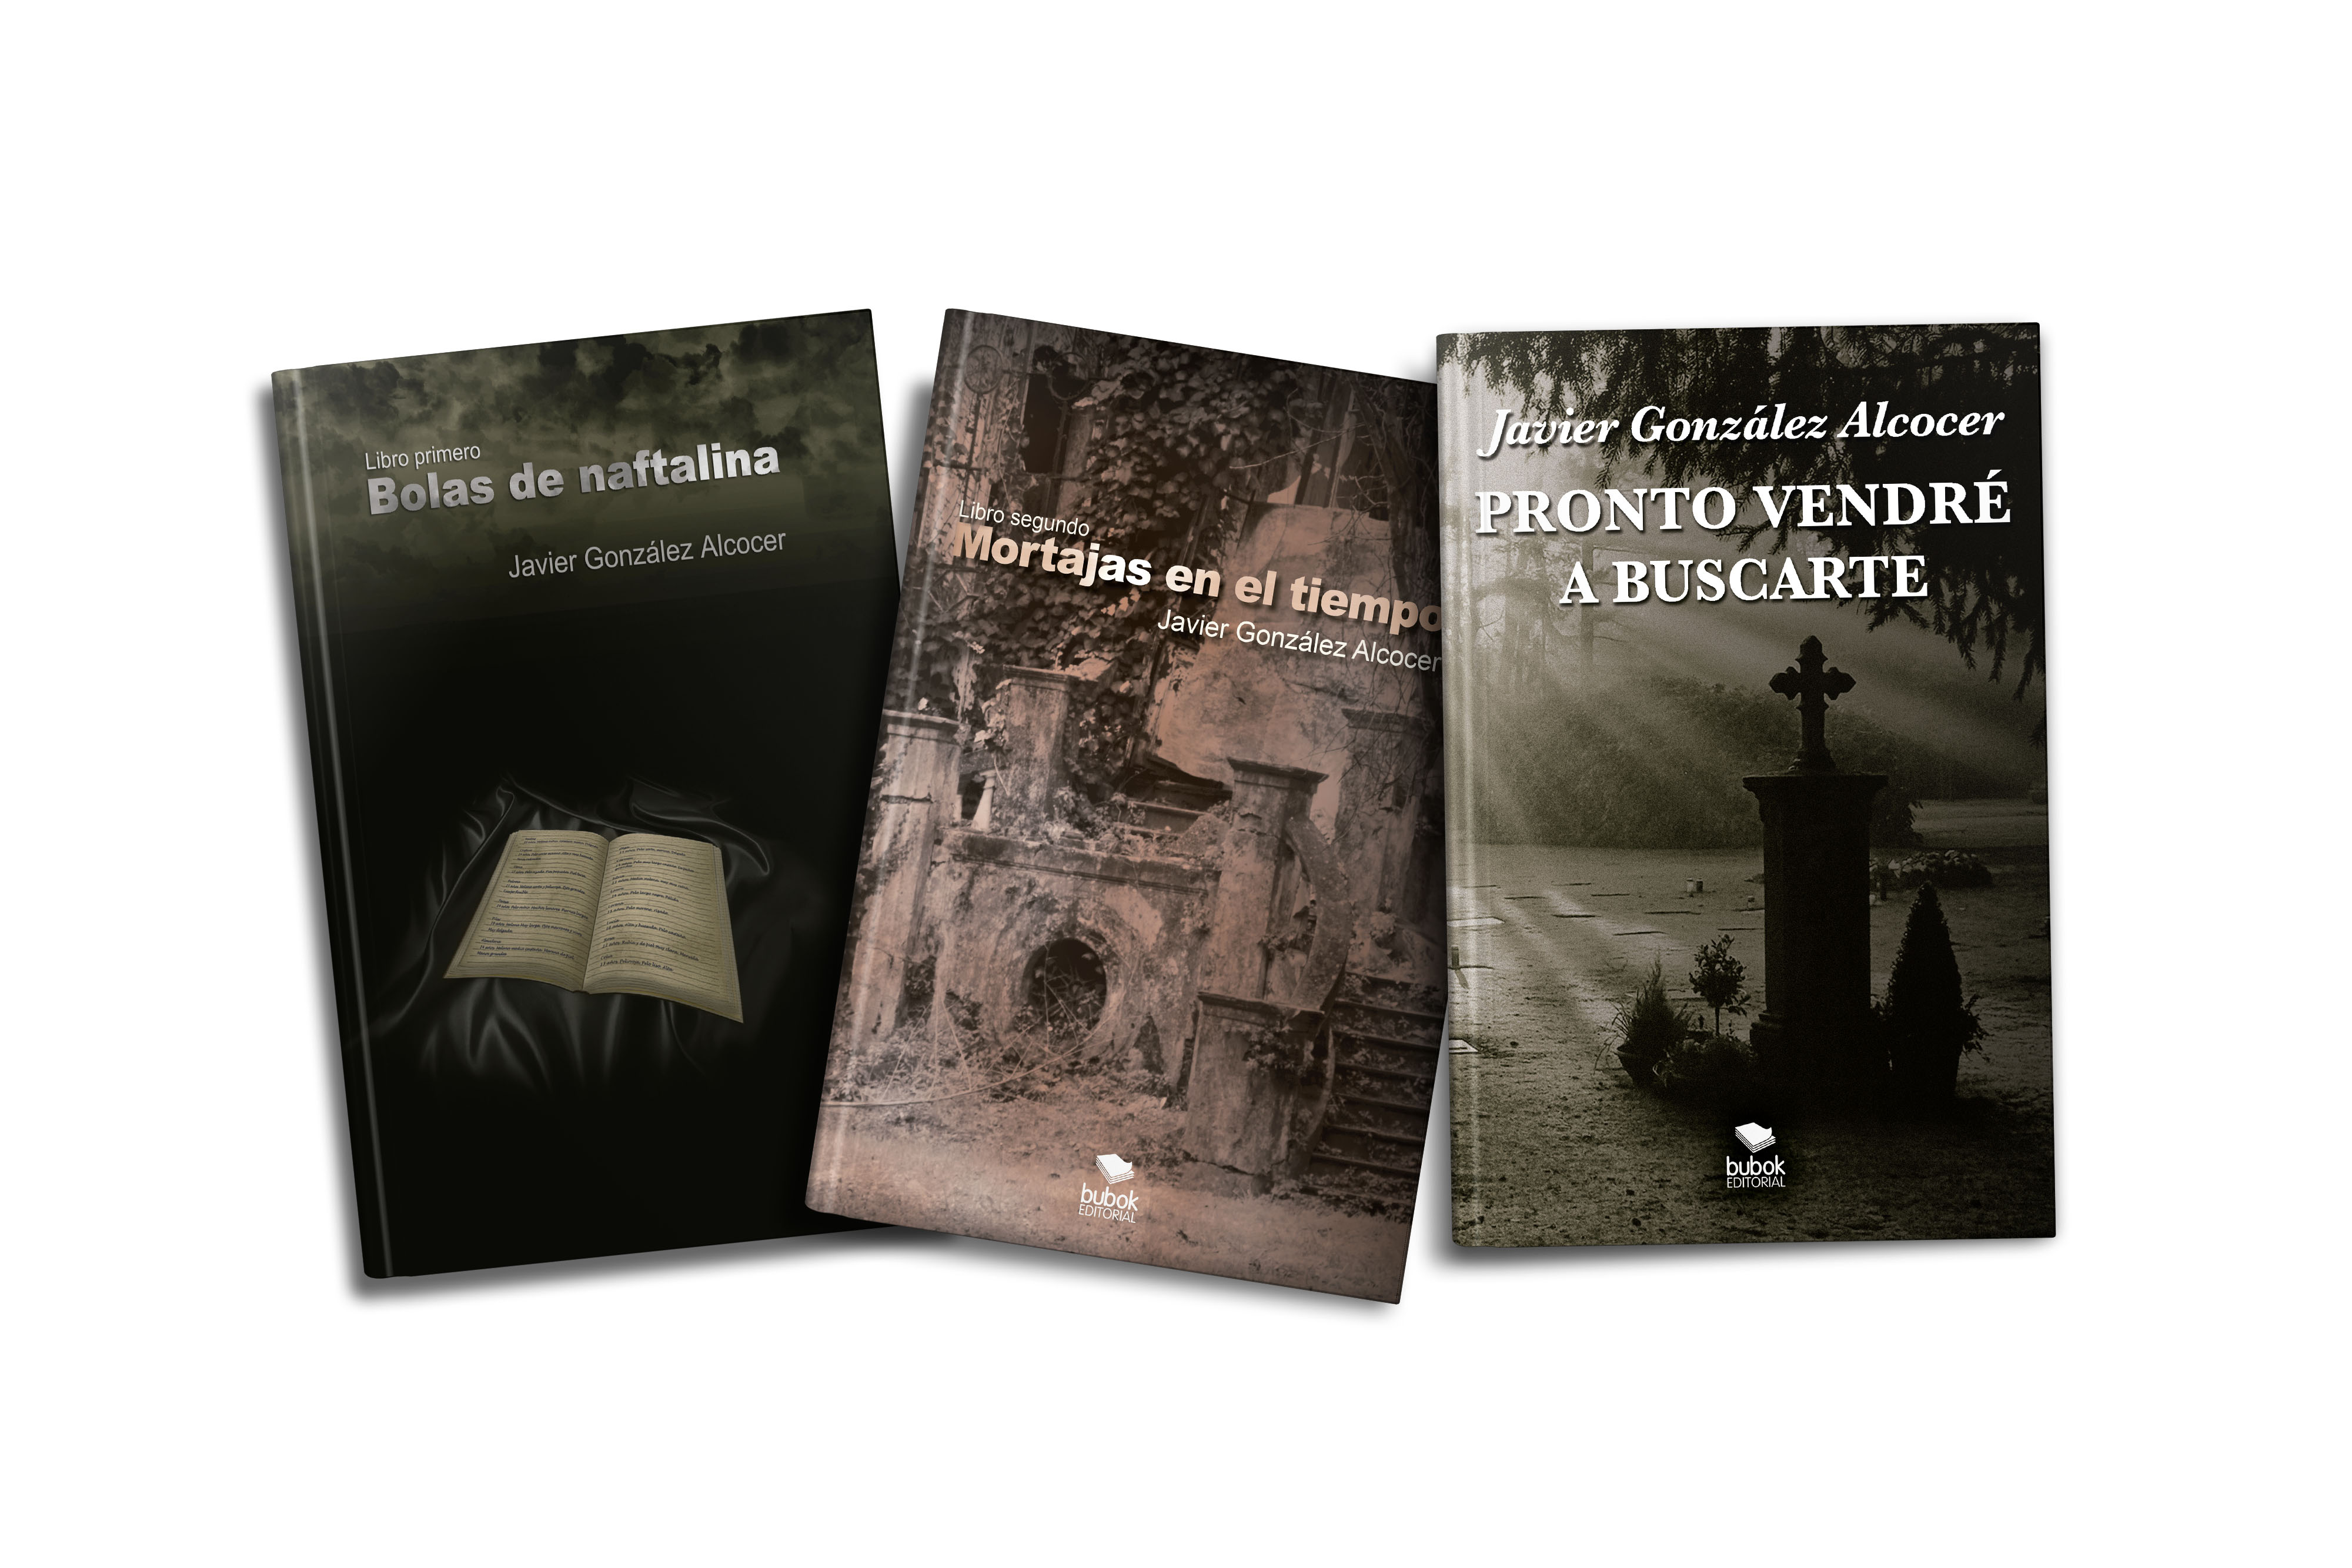 libros Javier González Alcocer